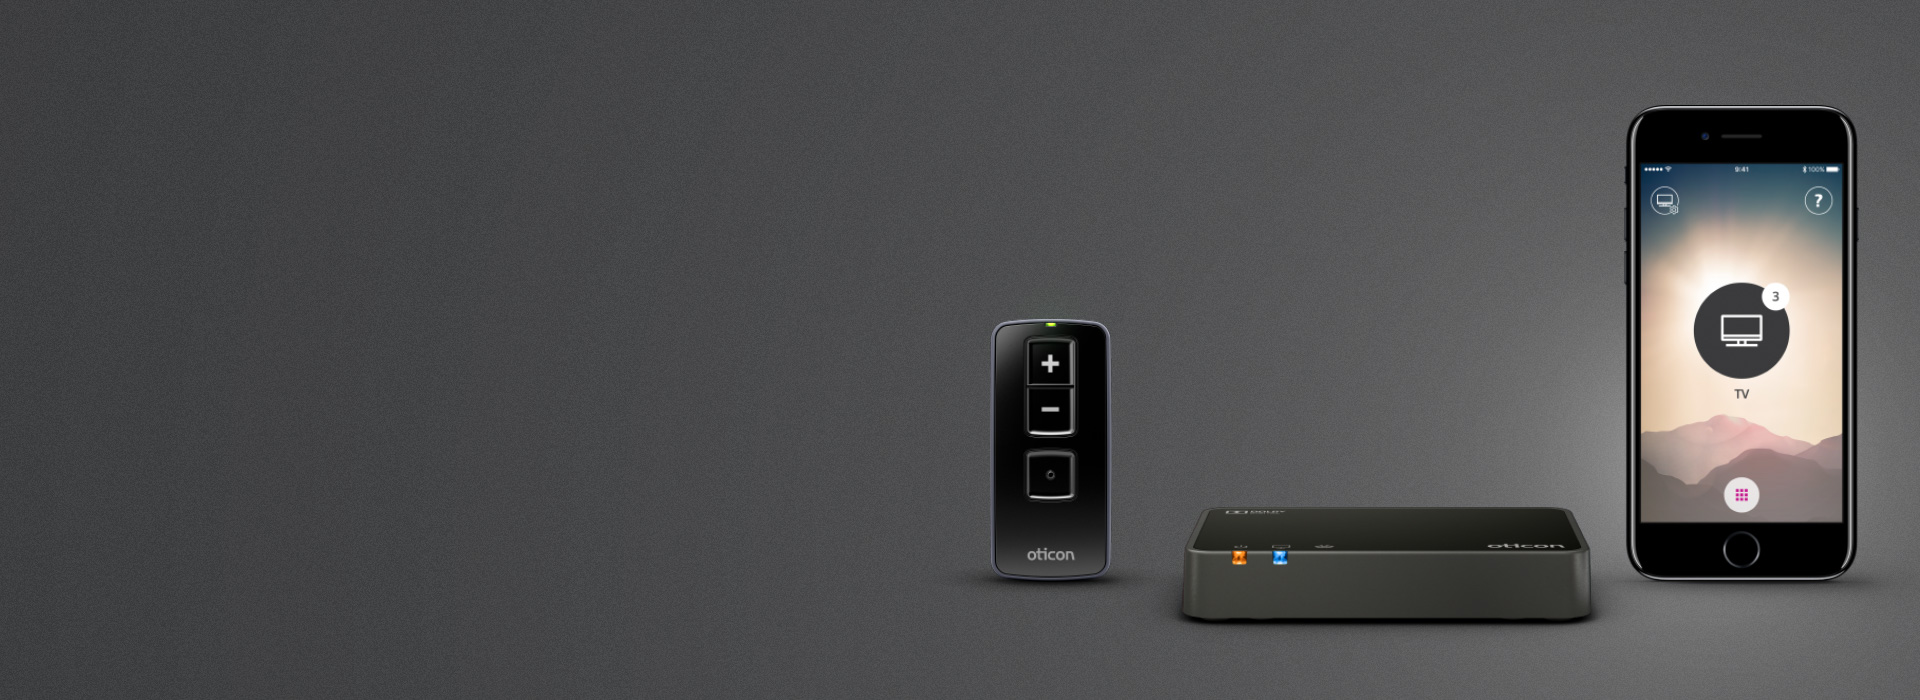 OPN connectivity